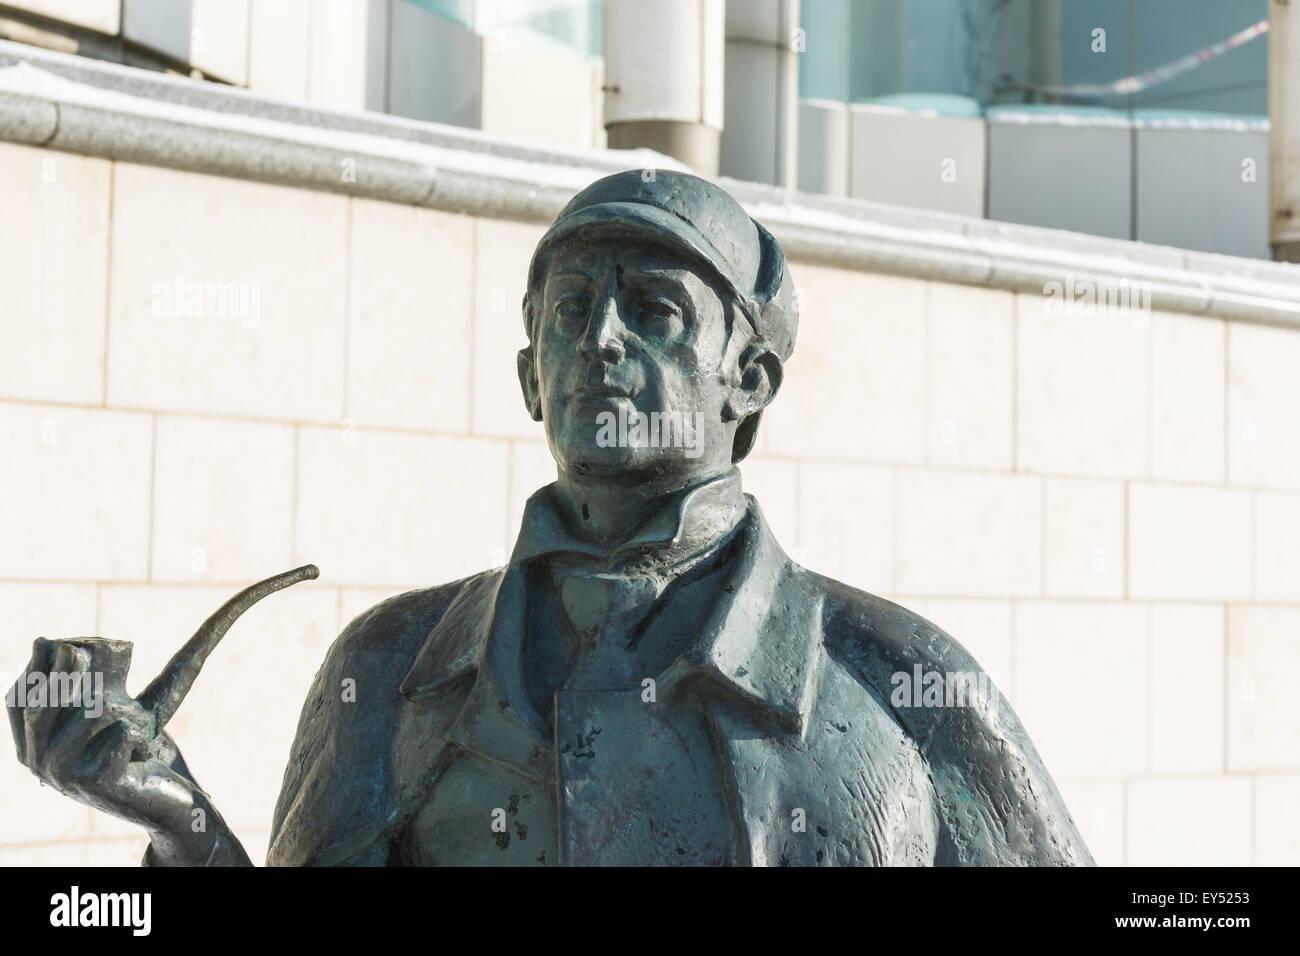 Are Vasiliy Livanov and Vitaly Solomin like Holmes and Watson?